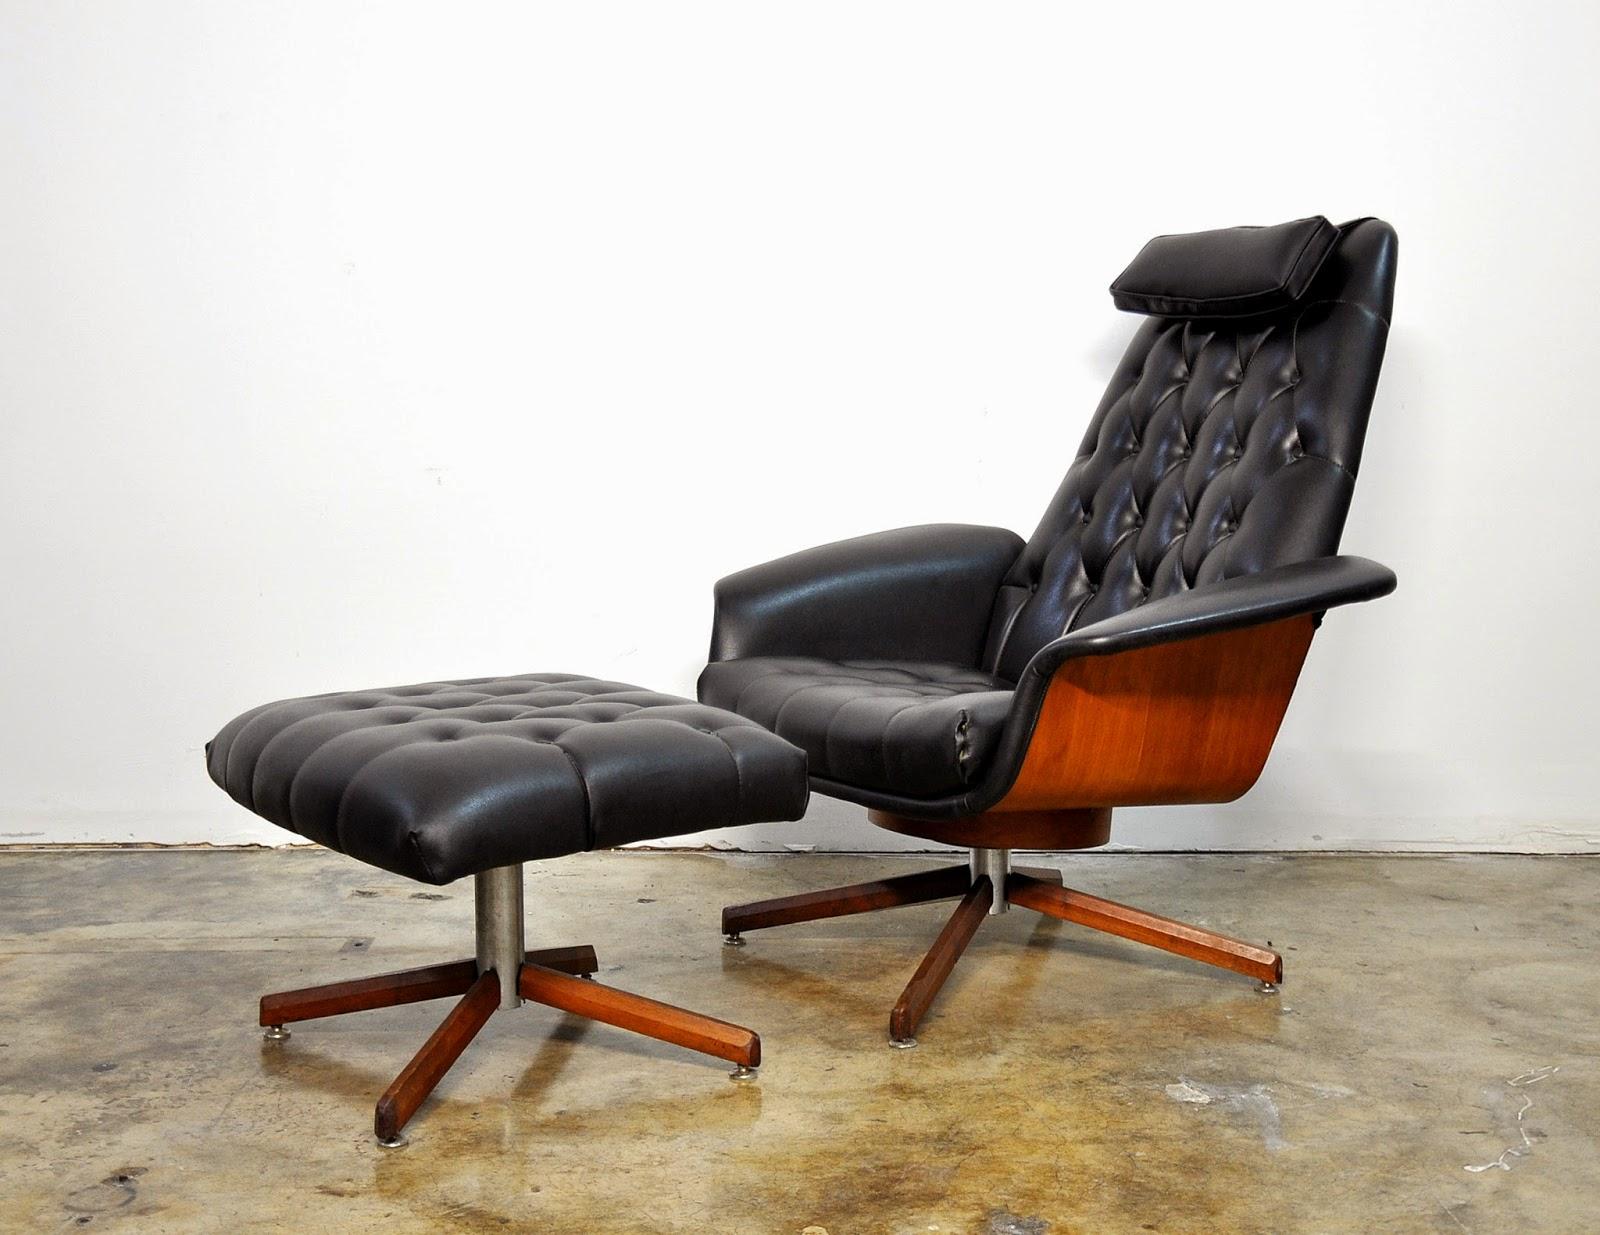 Attirant George Mulhauser Mr. Chair U0026 Ottoman